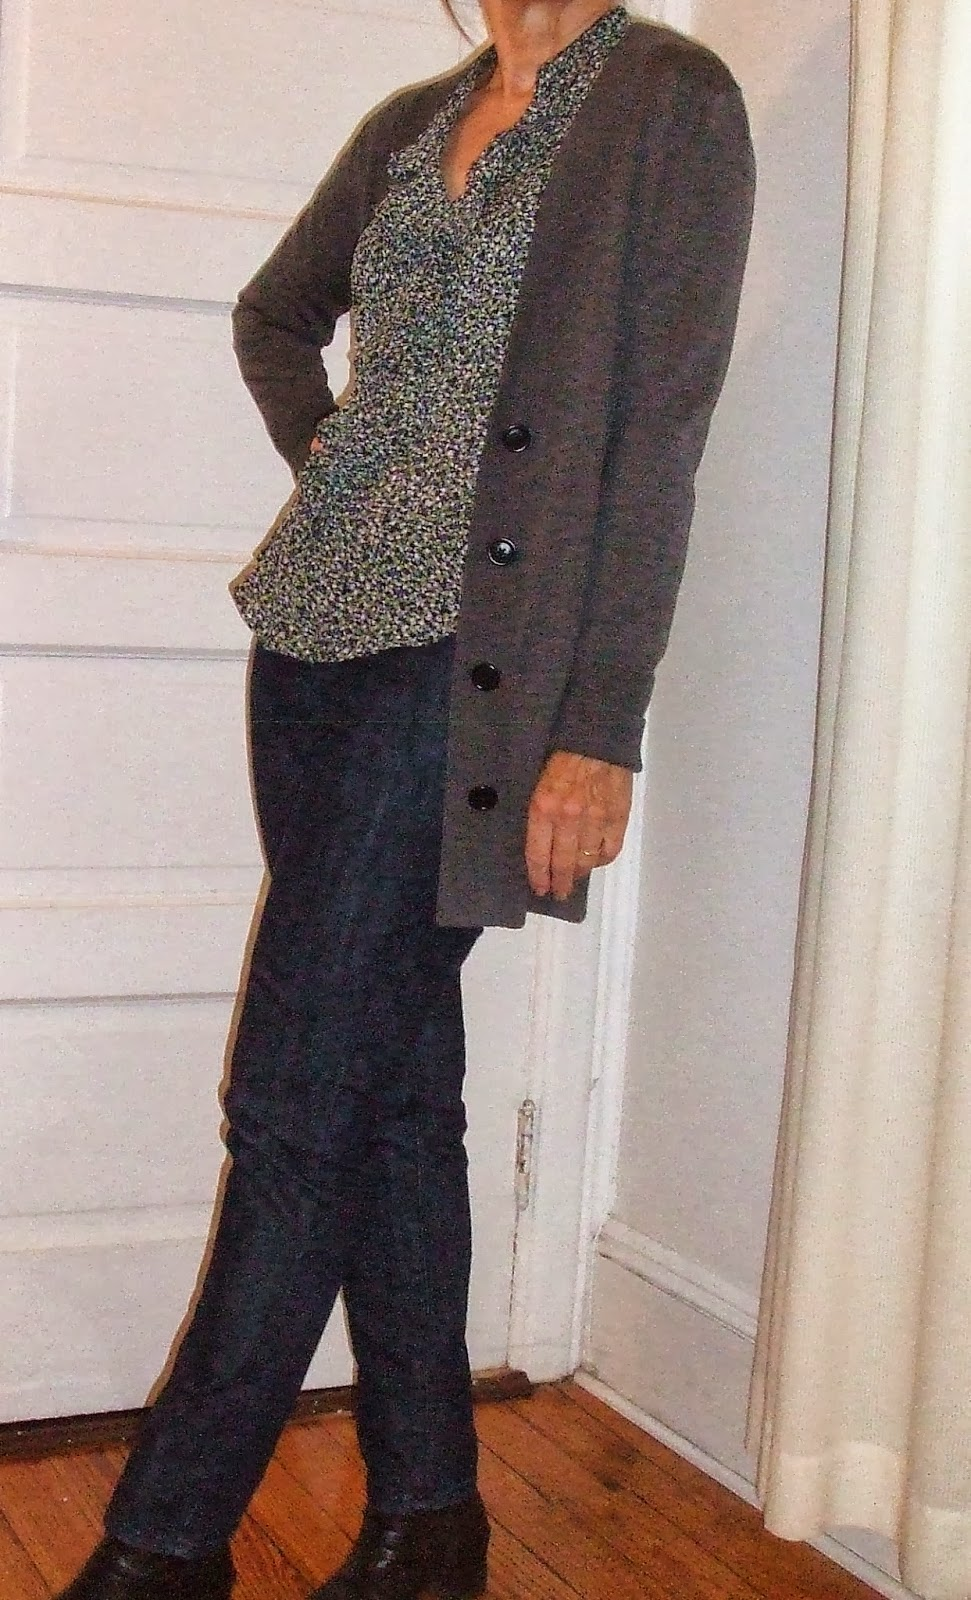 boyfriend sweater for women over 50